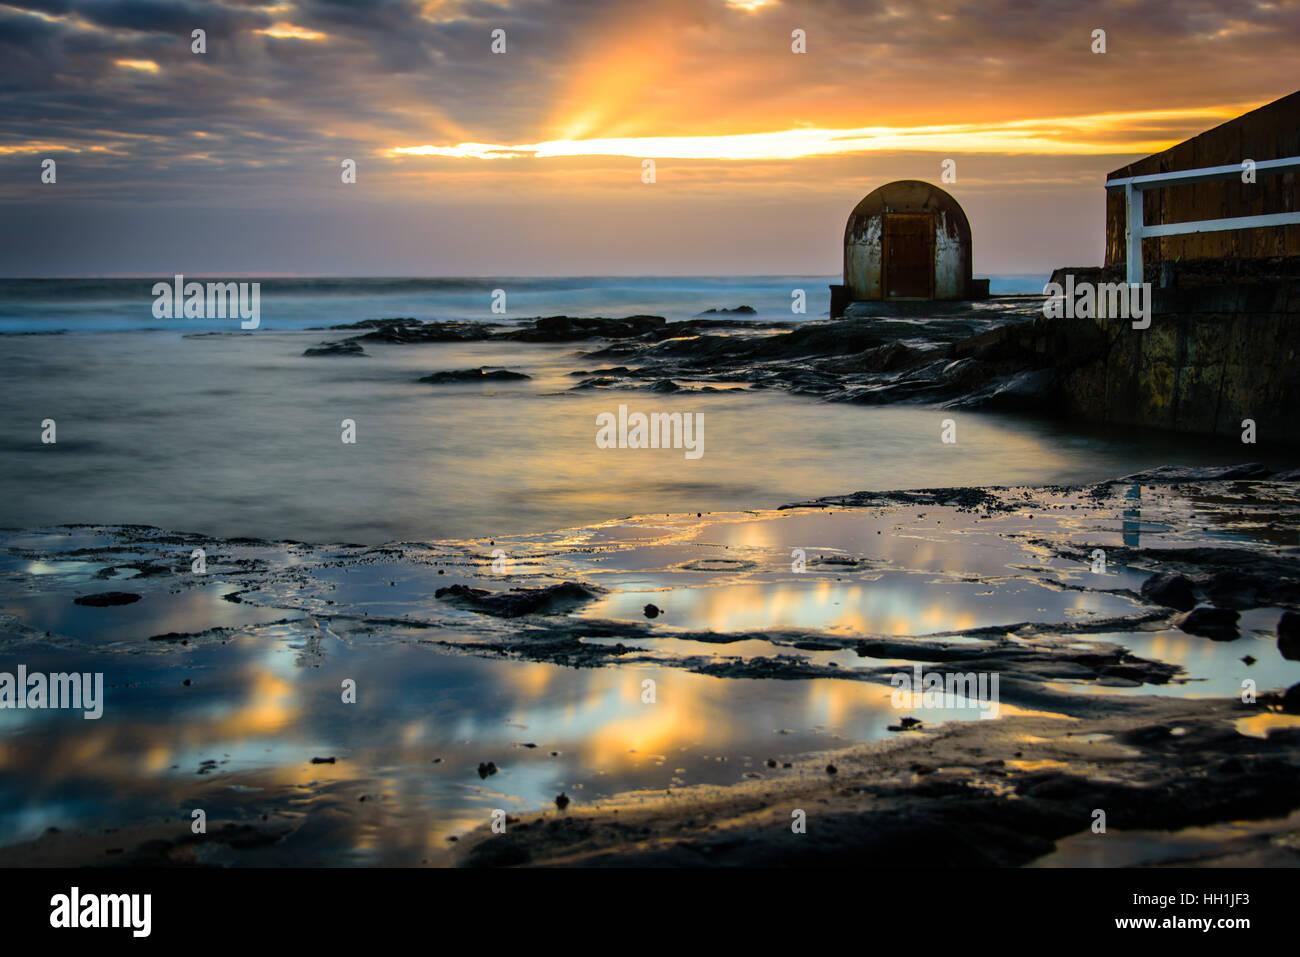 Nobby's Beach Newcastle at sunrise - Stock Image